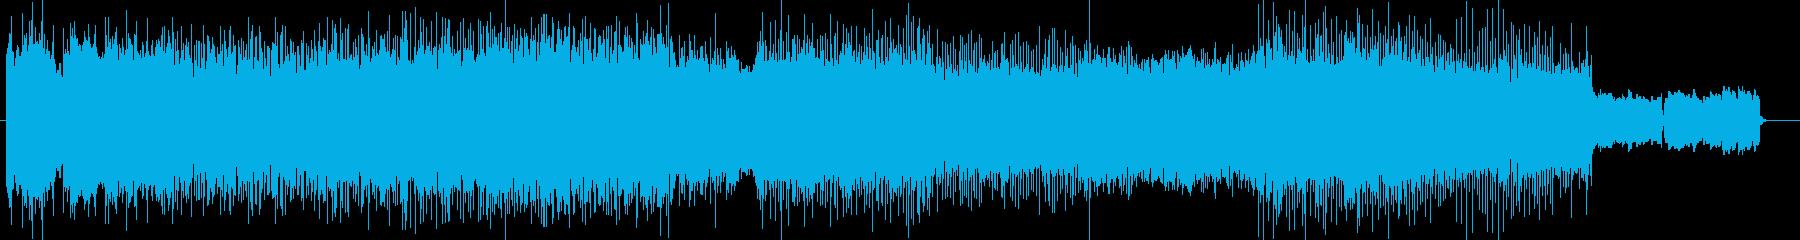 「HR/HM」「DARK」BGM44の再生済みの波形